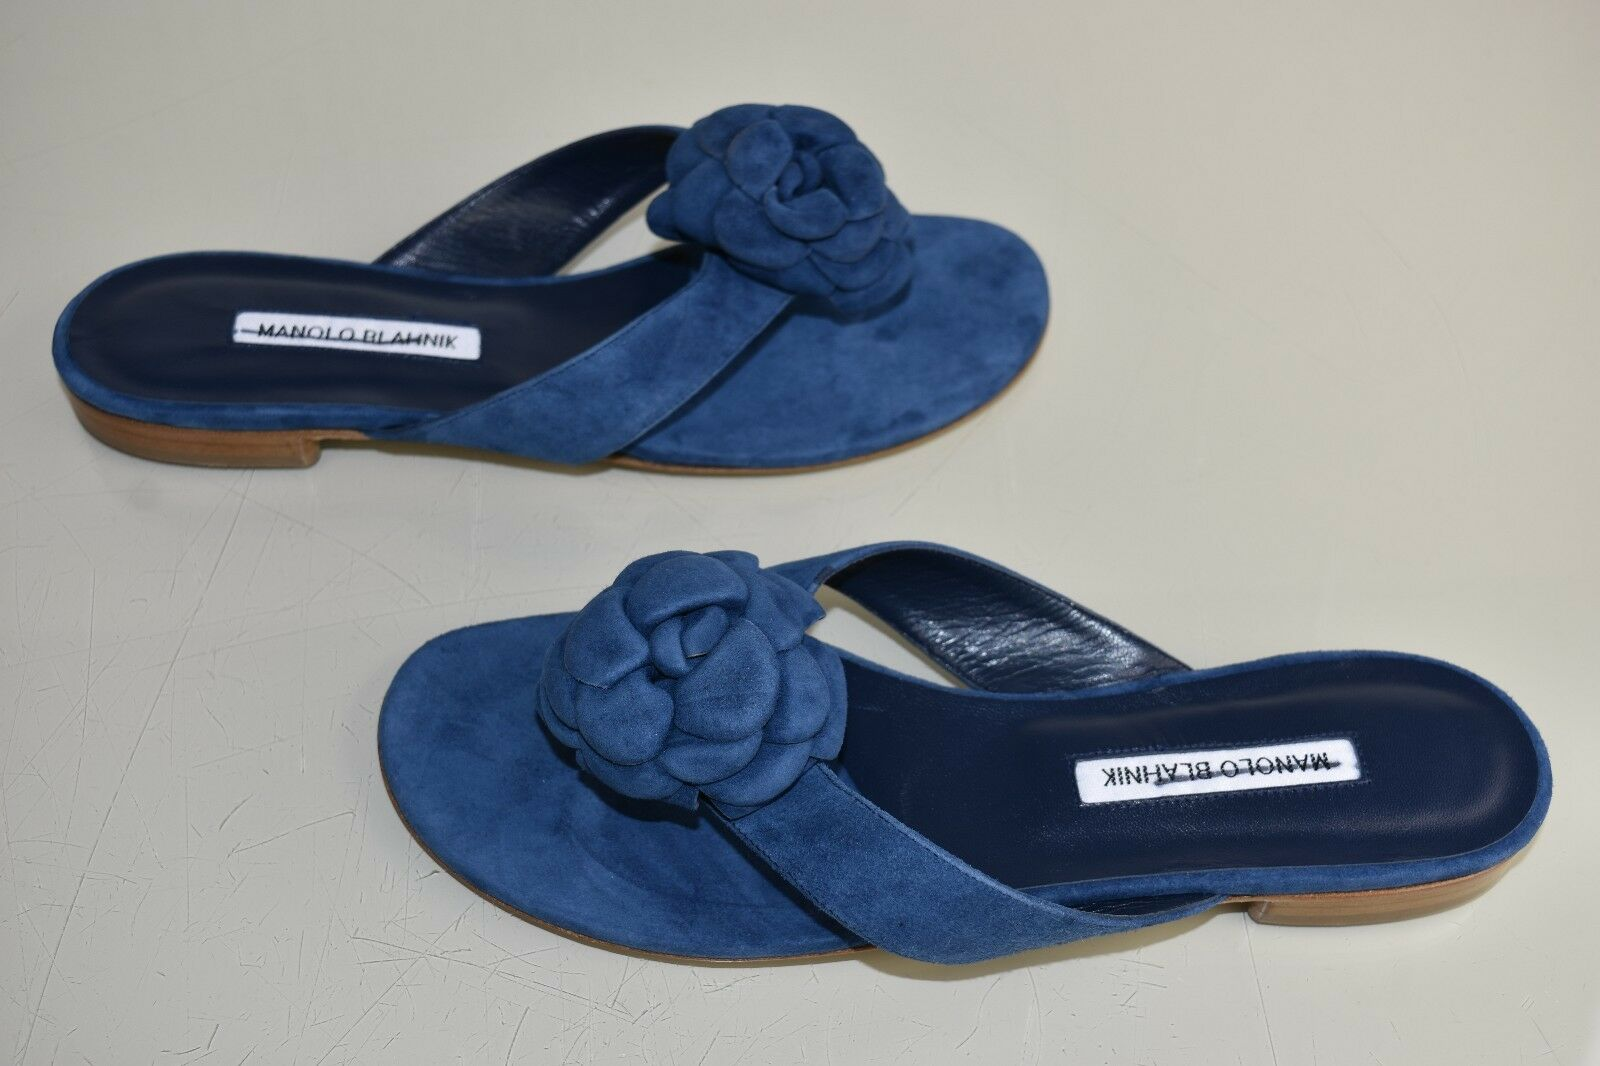 Neuf Manolo Blahnik Petala 3 D Camellia Bleu Sandales en Daim Glissière